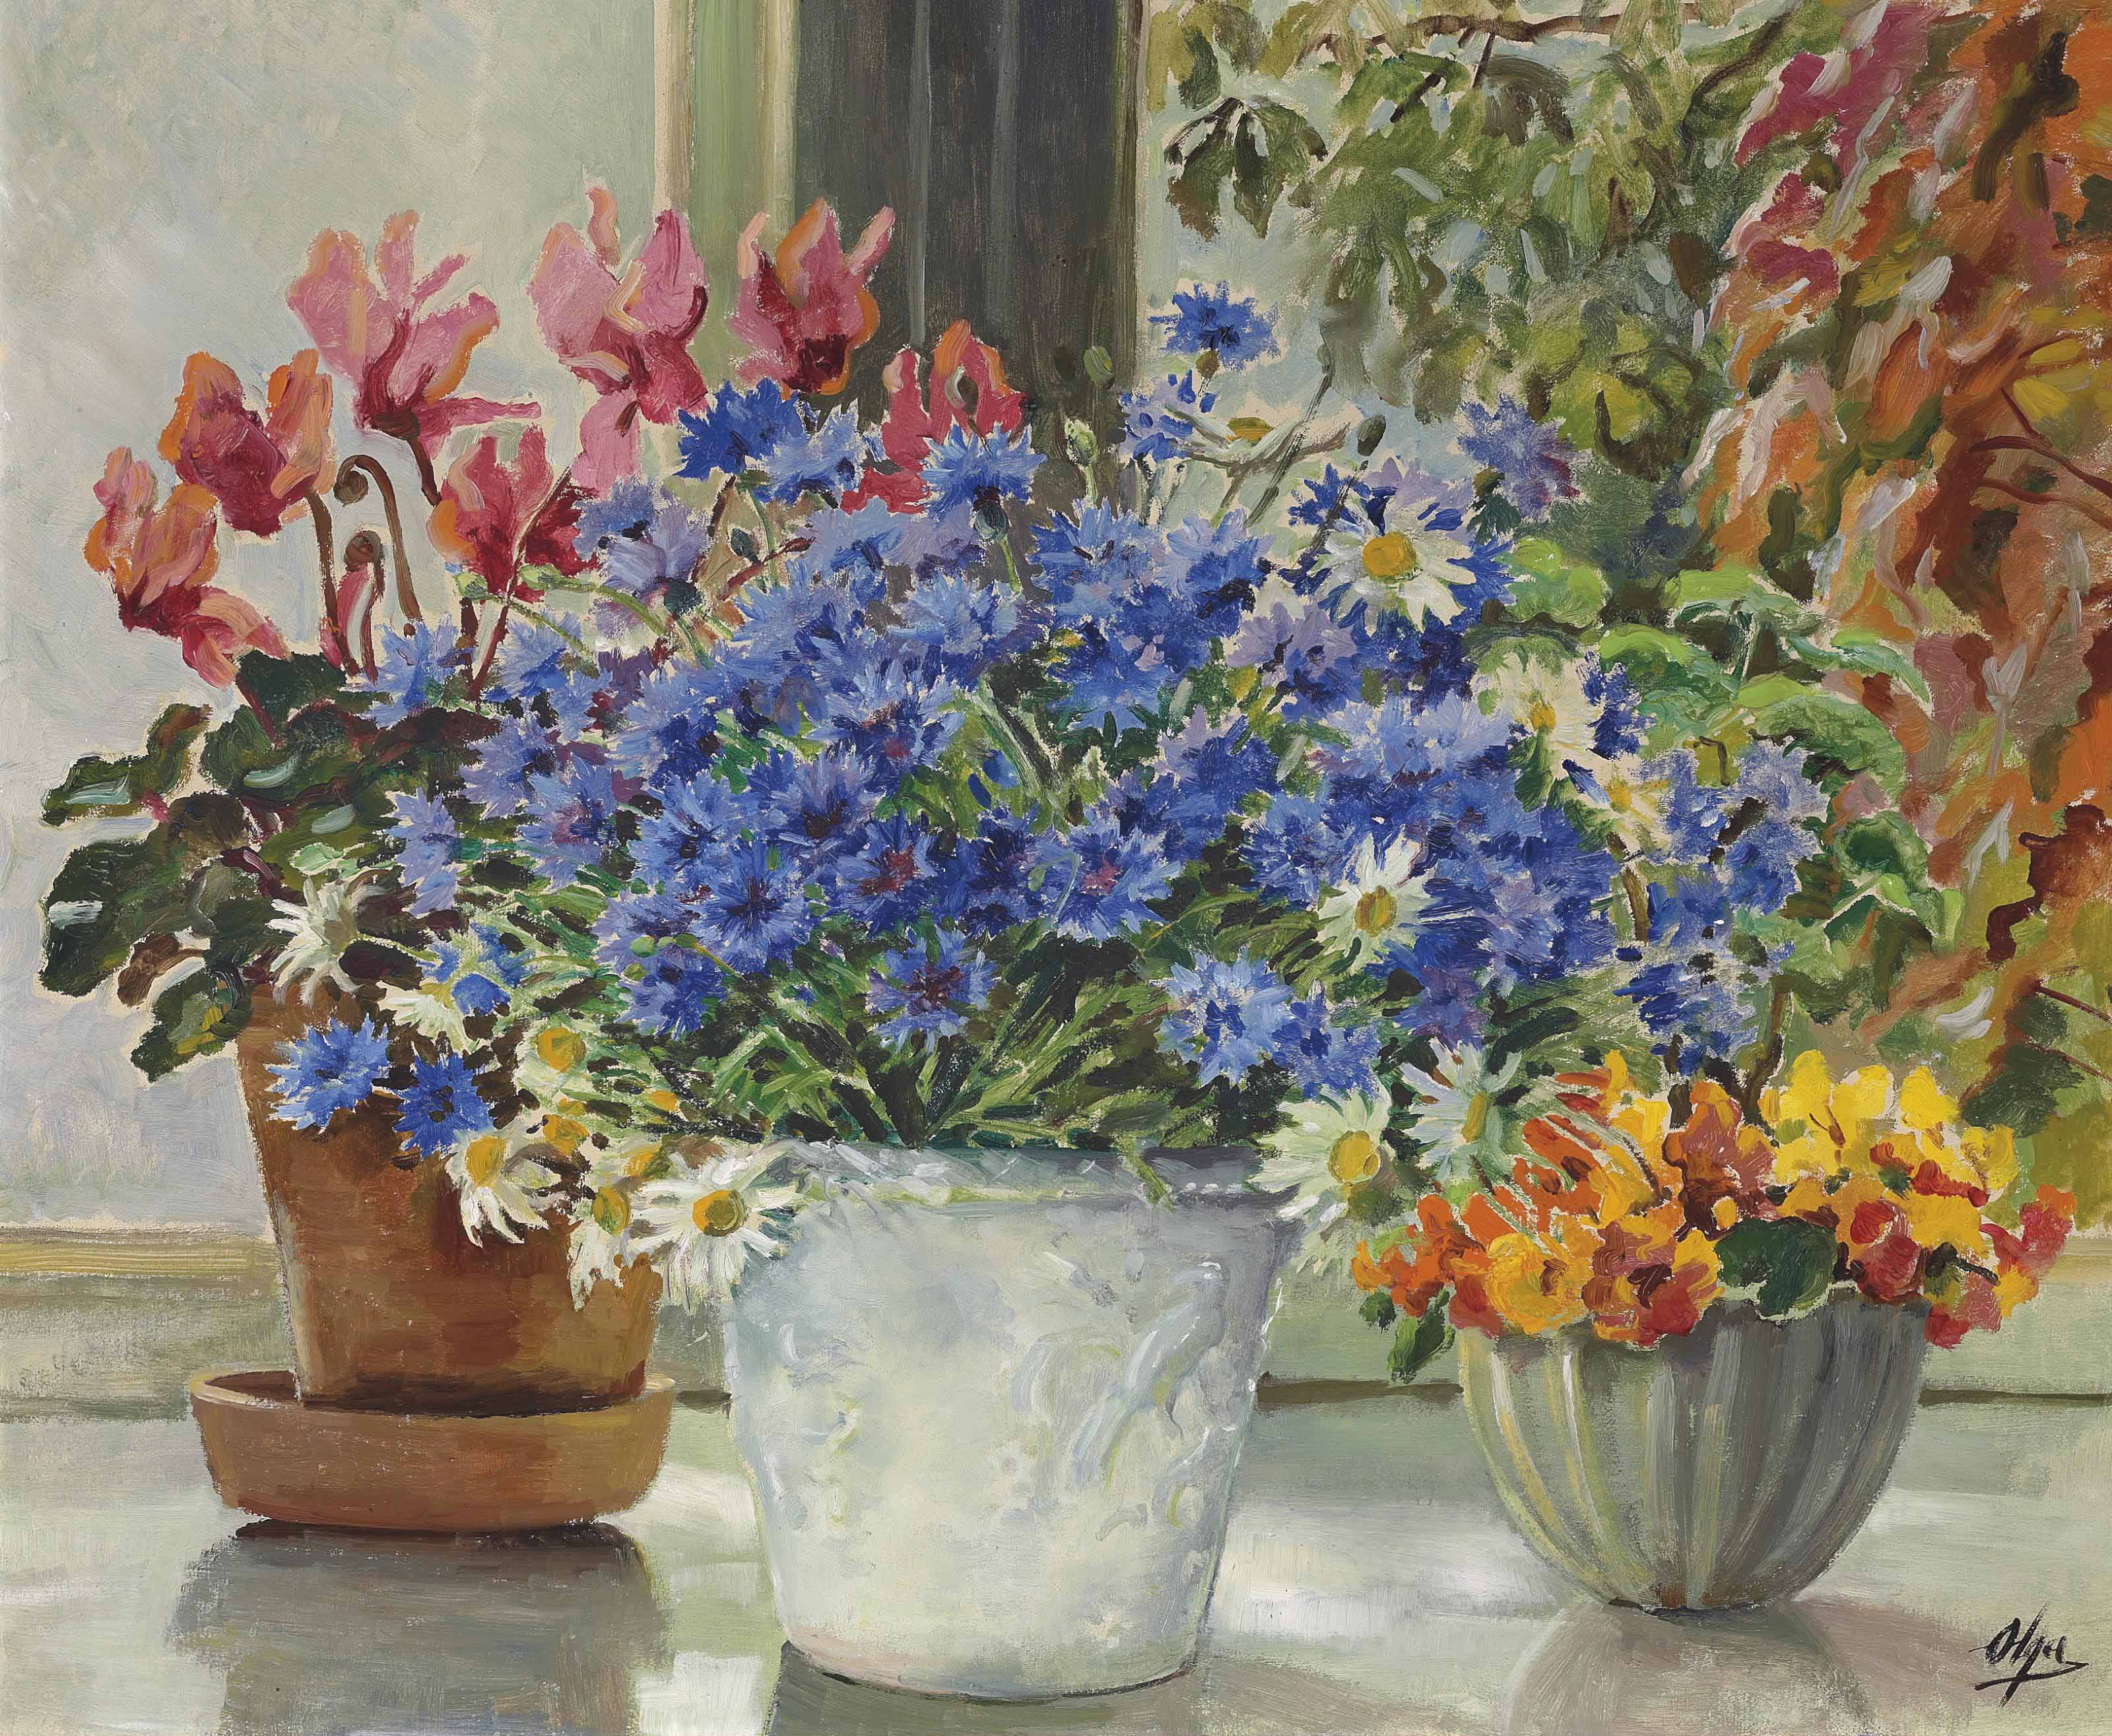 Still life with cornflowers, Michaelmas daisies, cyclamen and nasturtiums